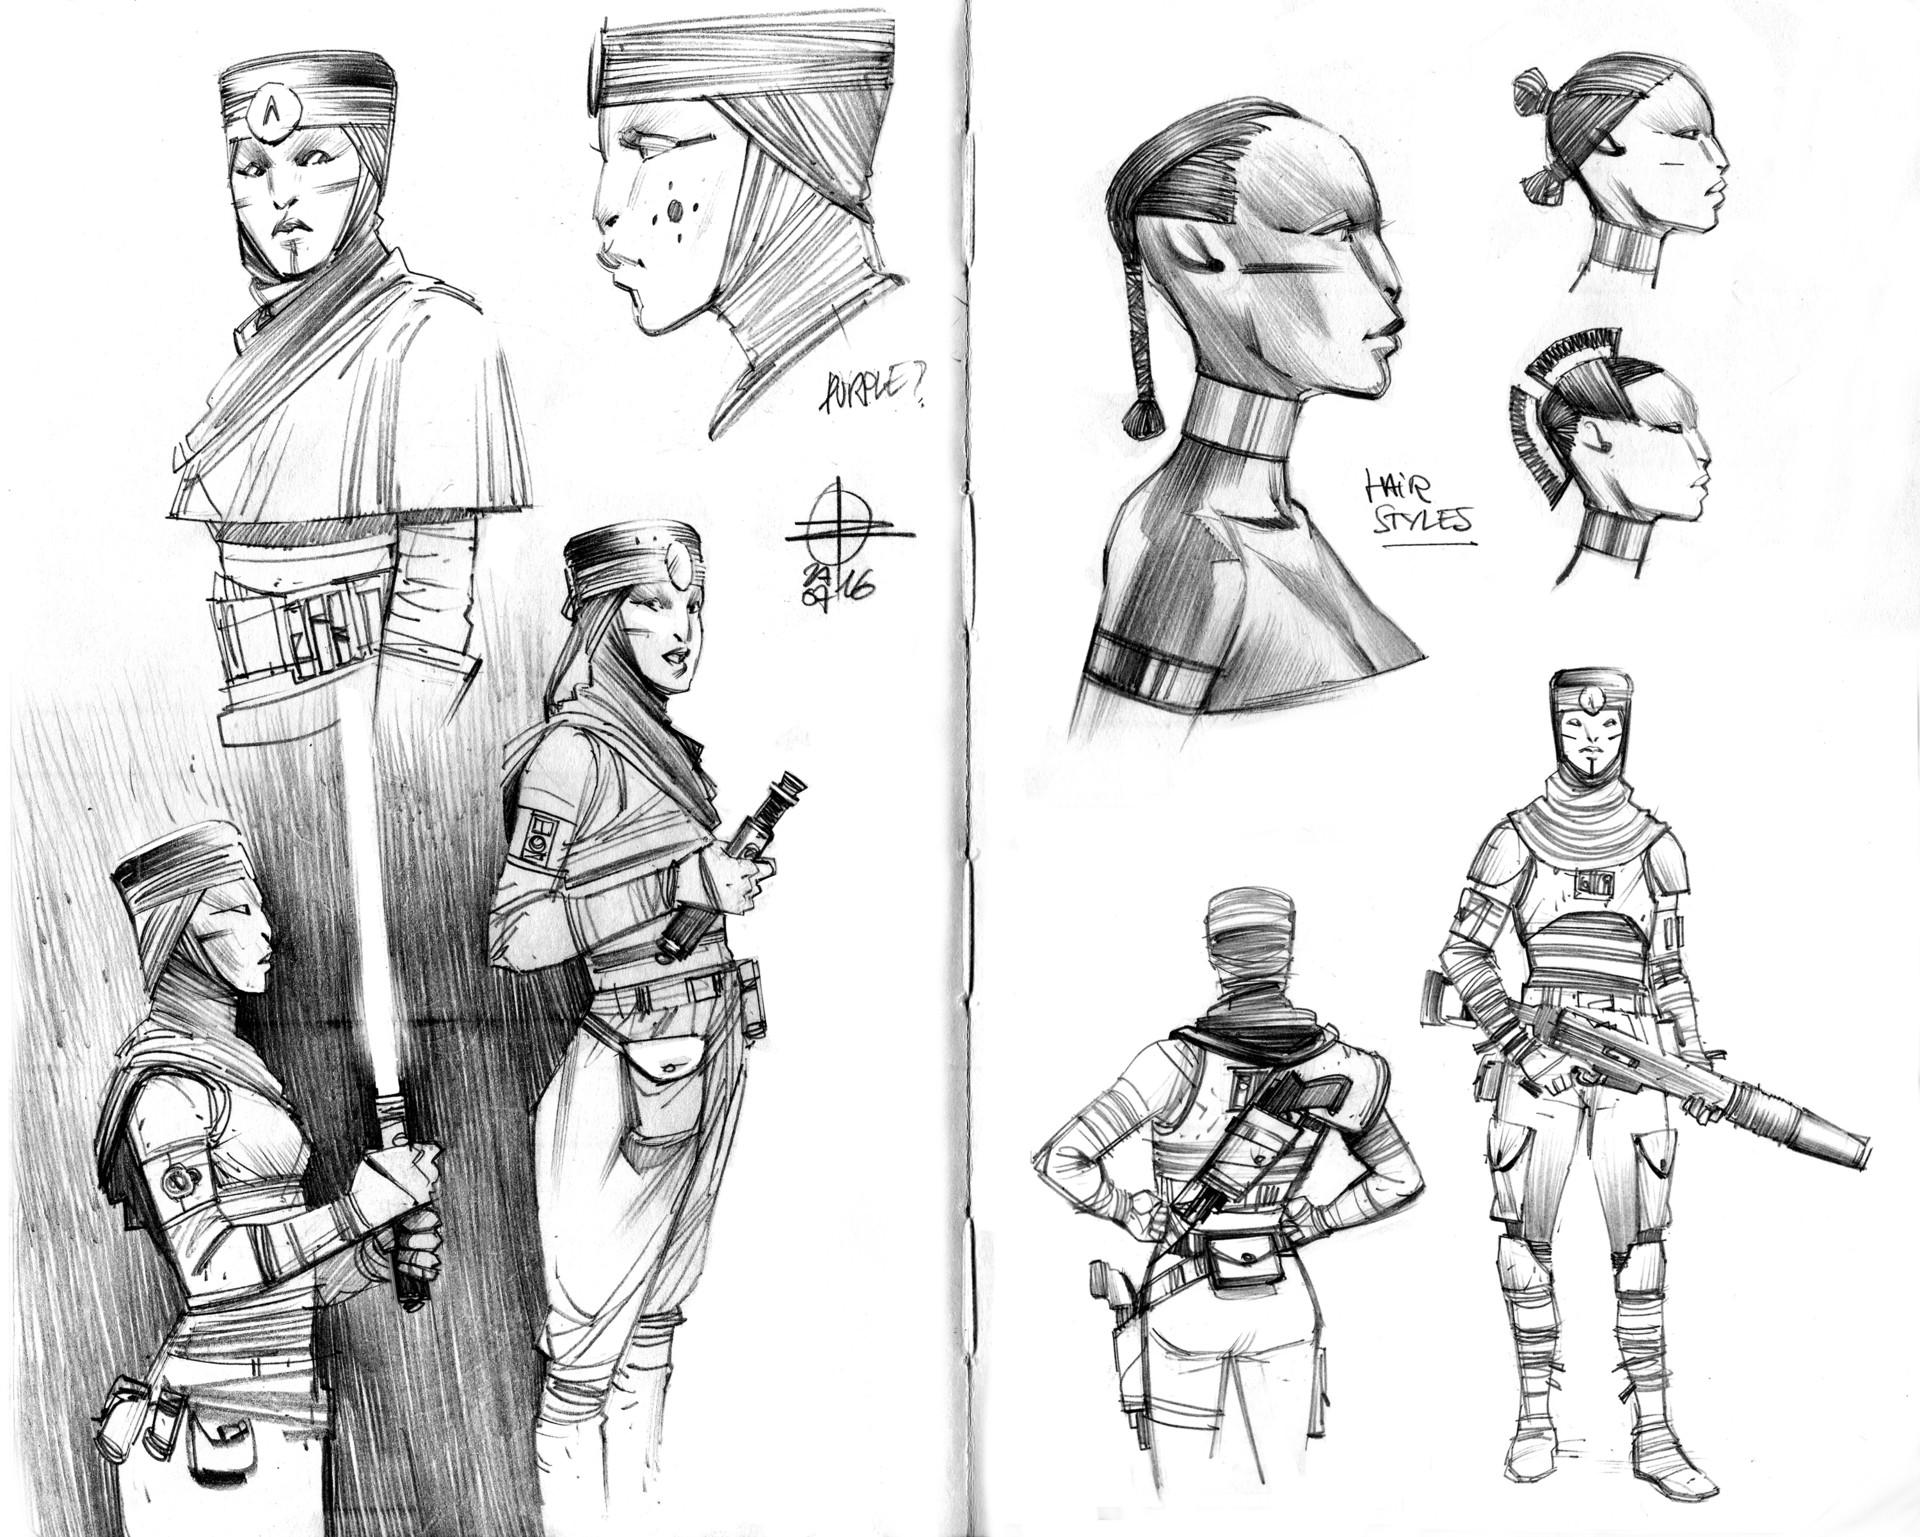 Renaud roche part05 sketches04b